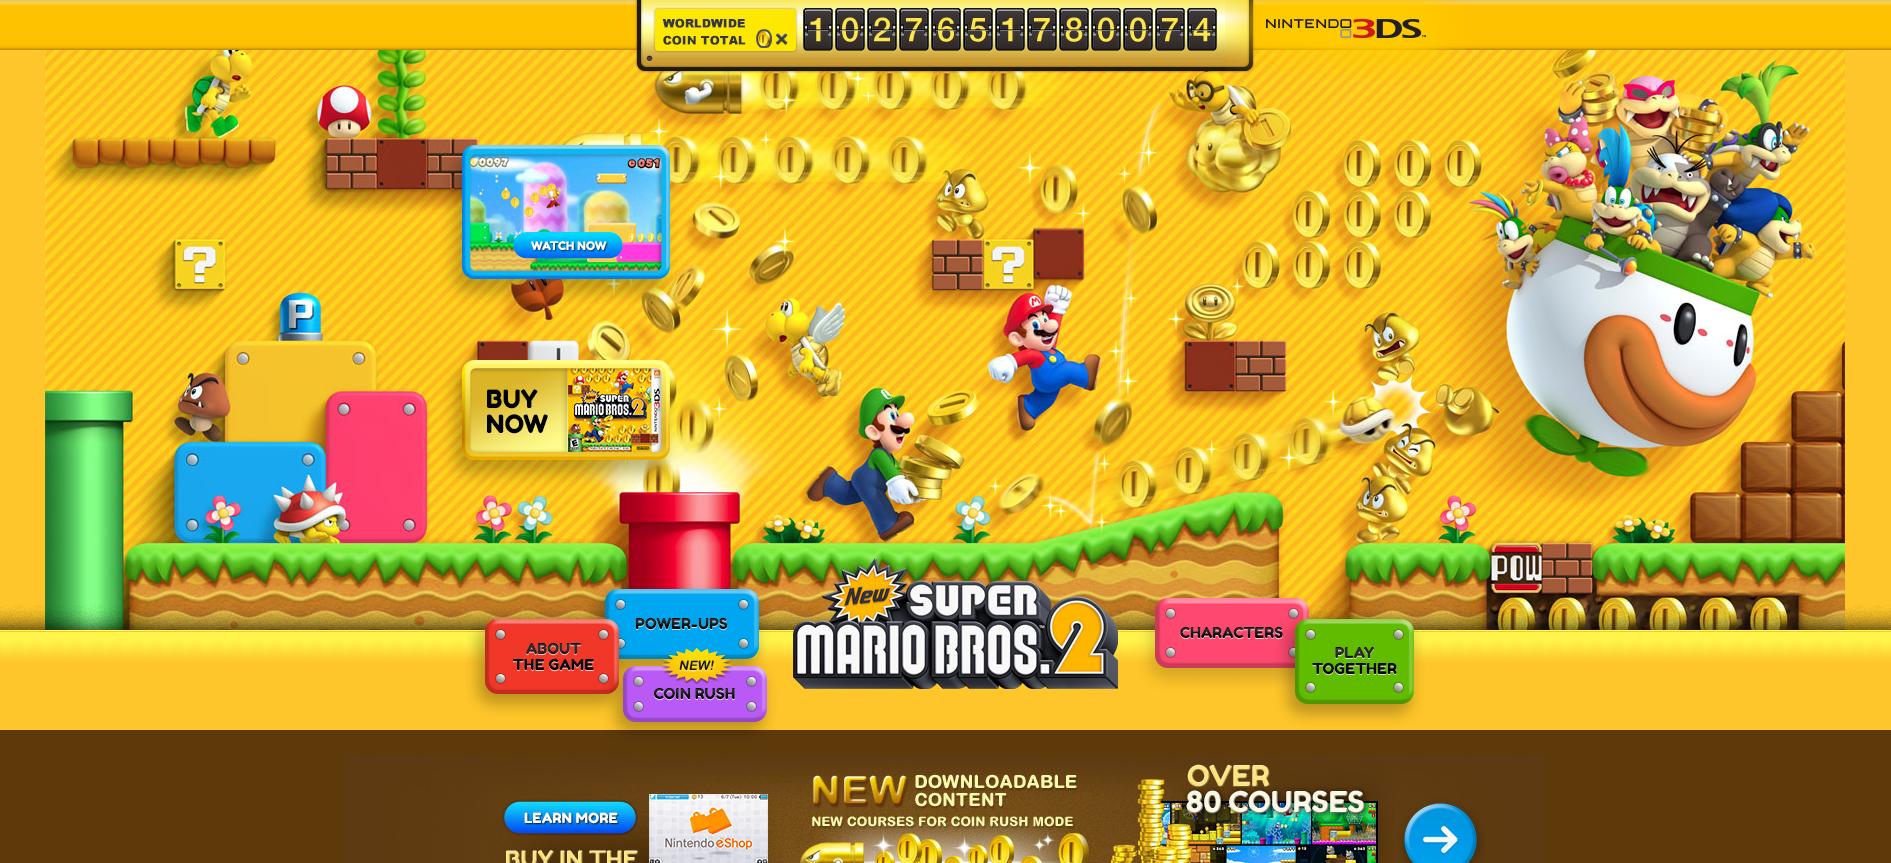 New Super Mario Bros  2 players collect over 1 trillion